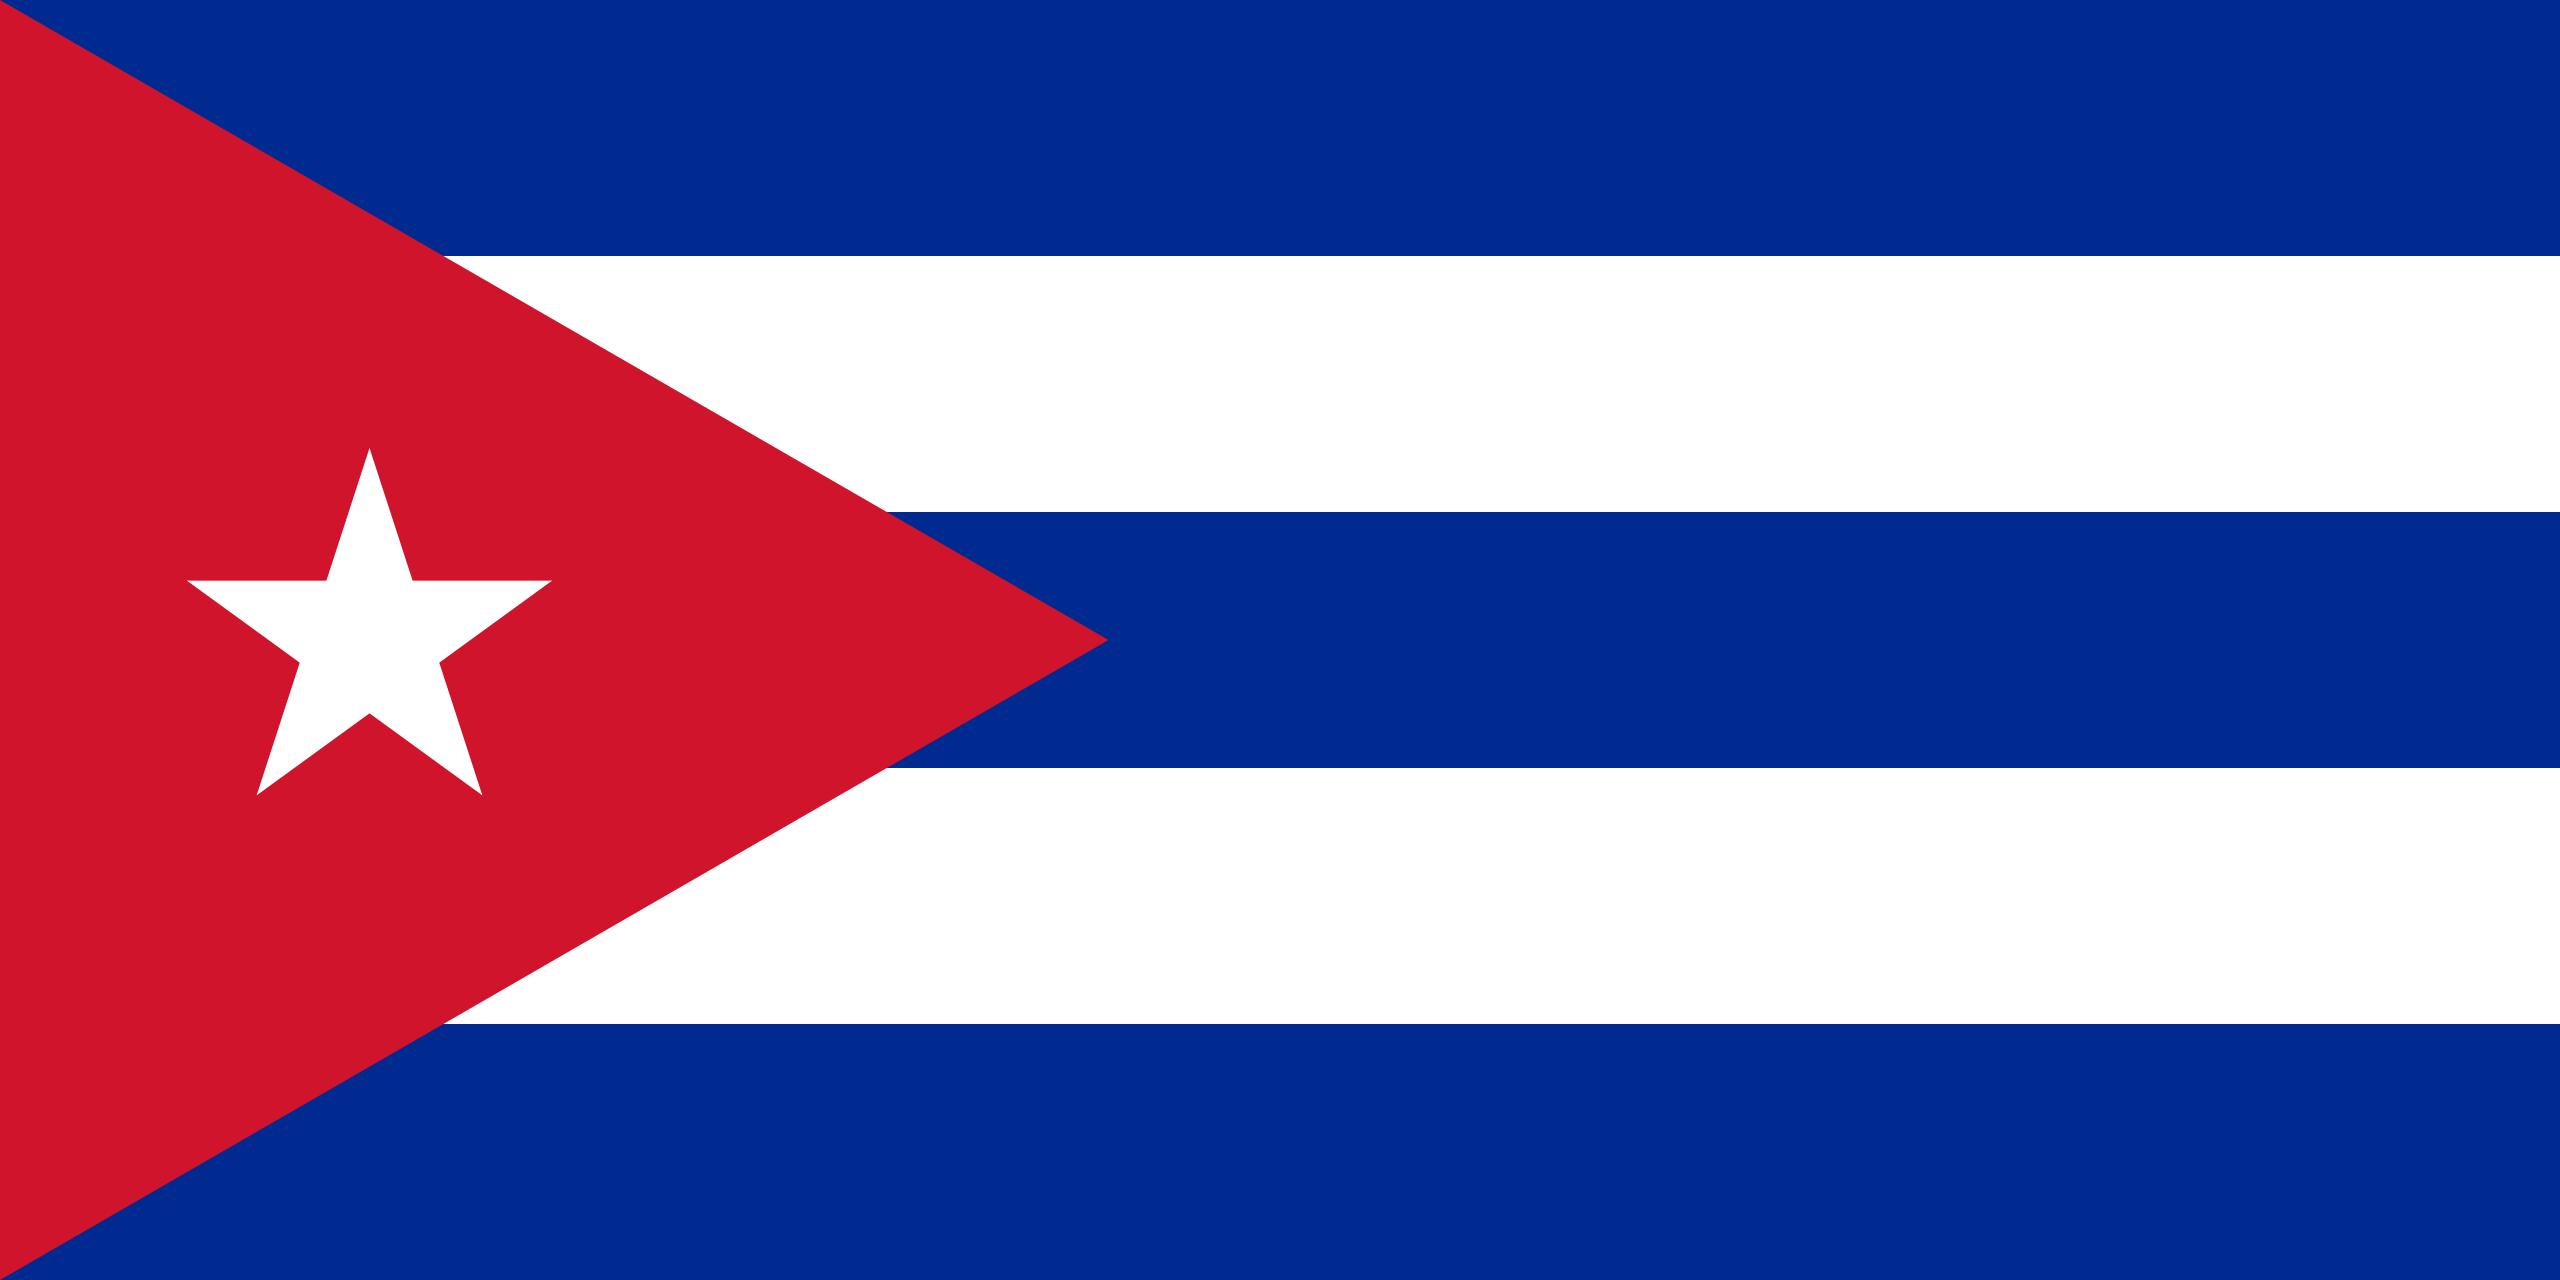 क्यूबा, देश, emblema, लोग�प्रतीकbolo - HD वॉलपेपर - प्रोफेसर-falken.com